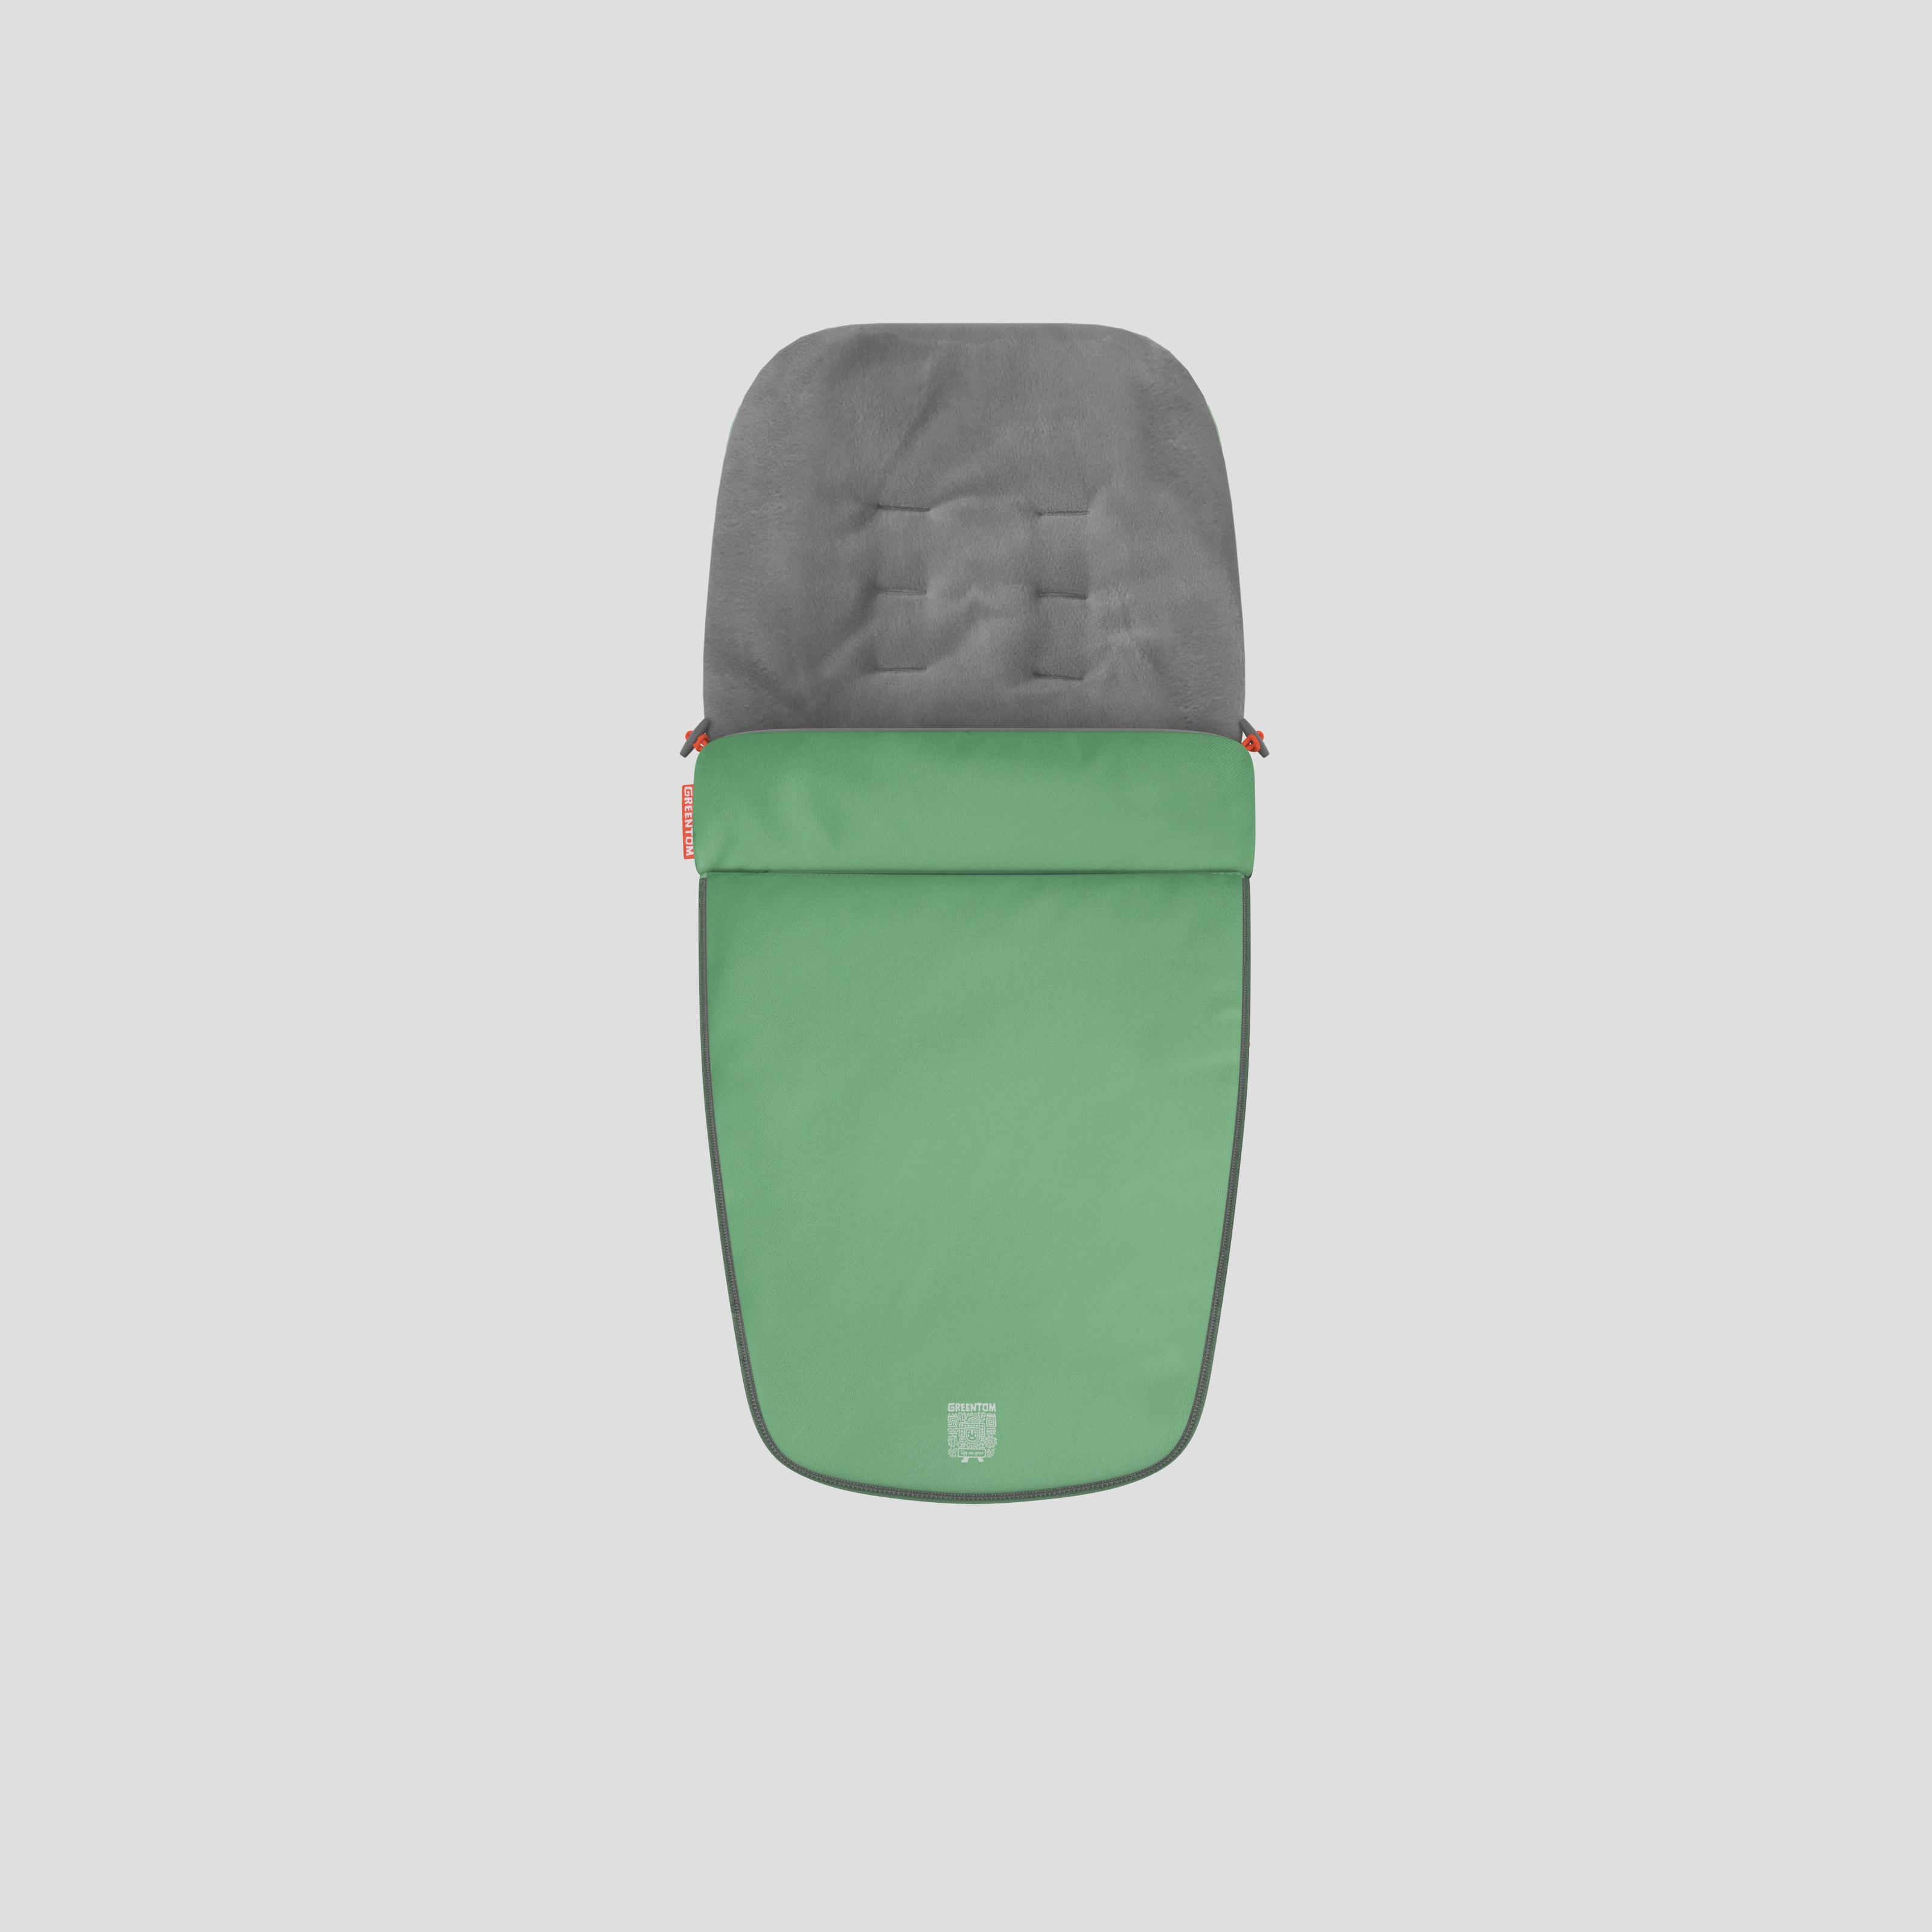 Greentom Footmuff Mint Affordable strollers, Stroller